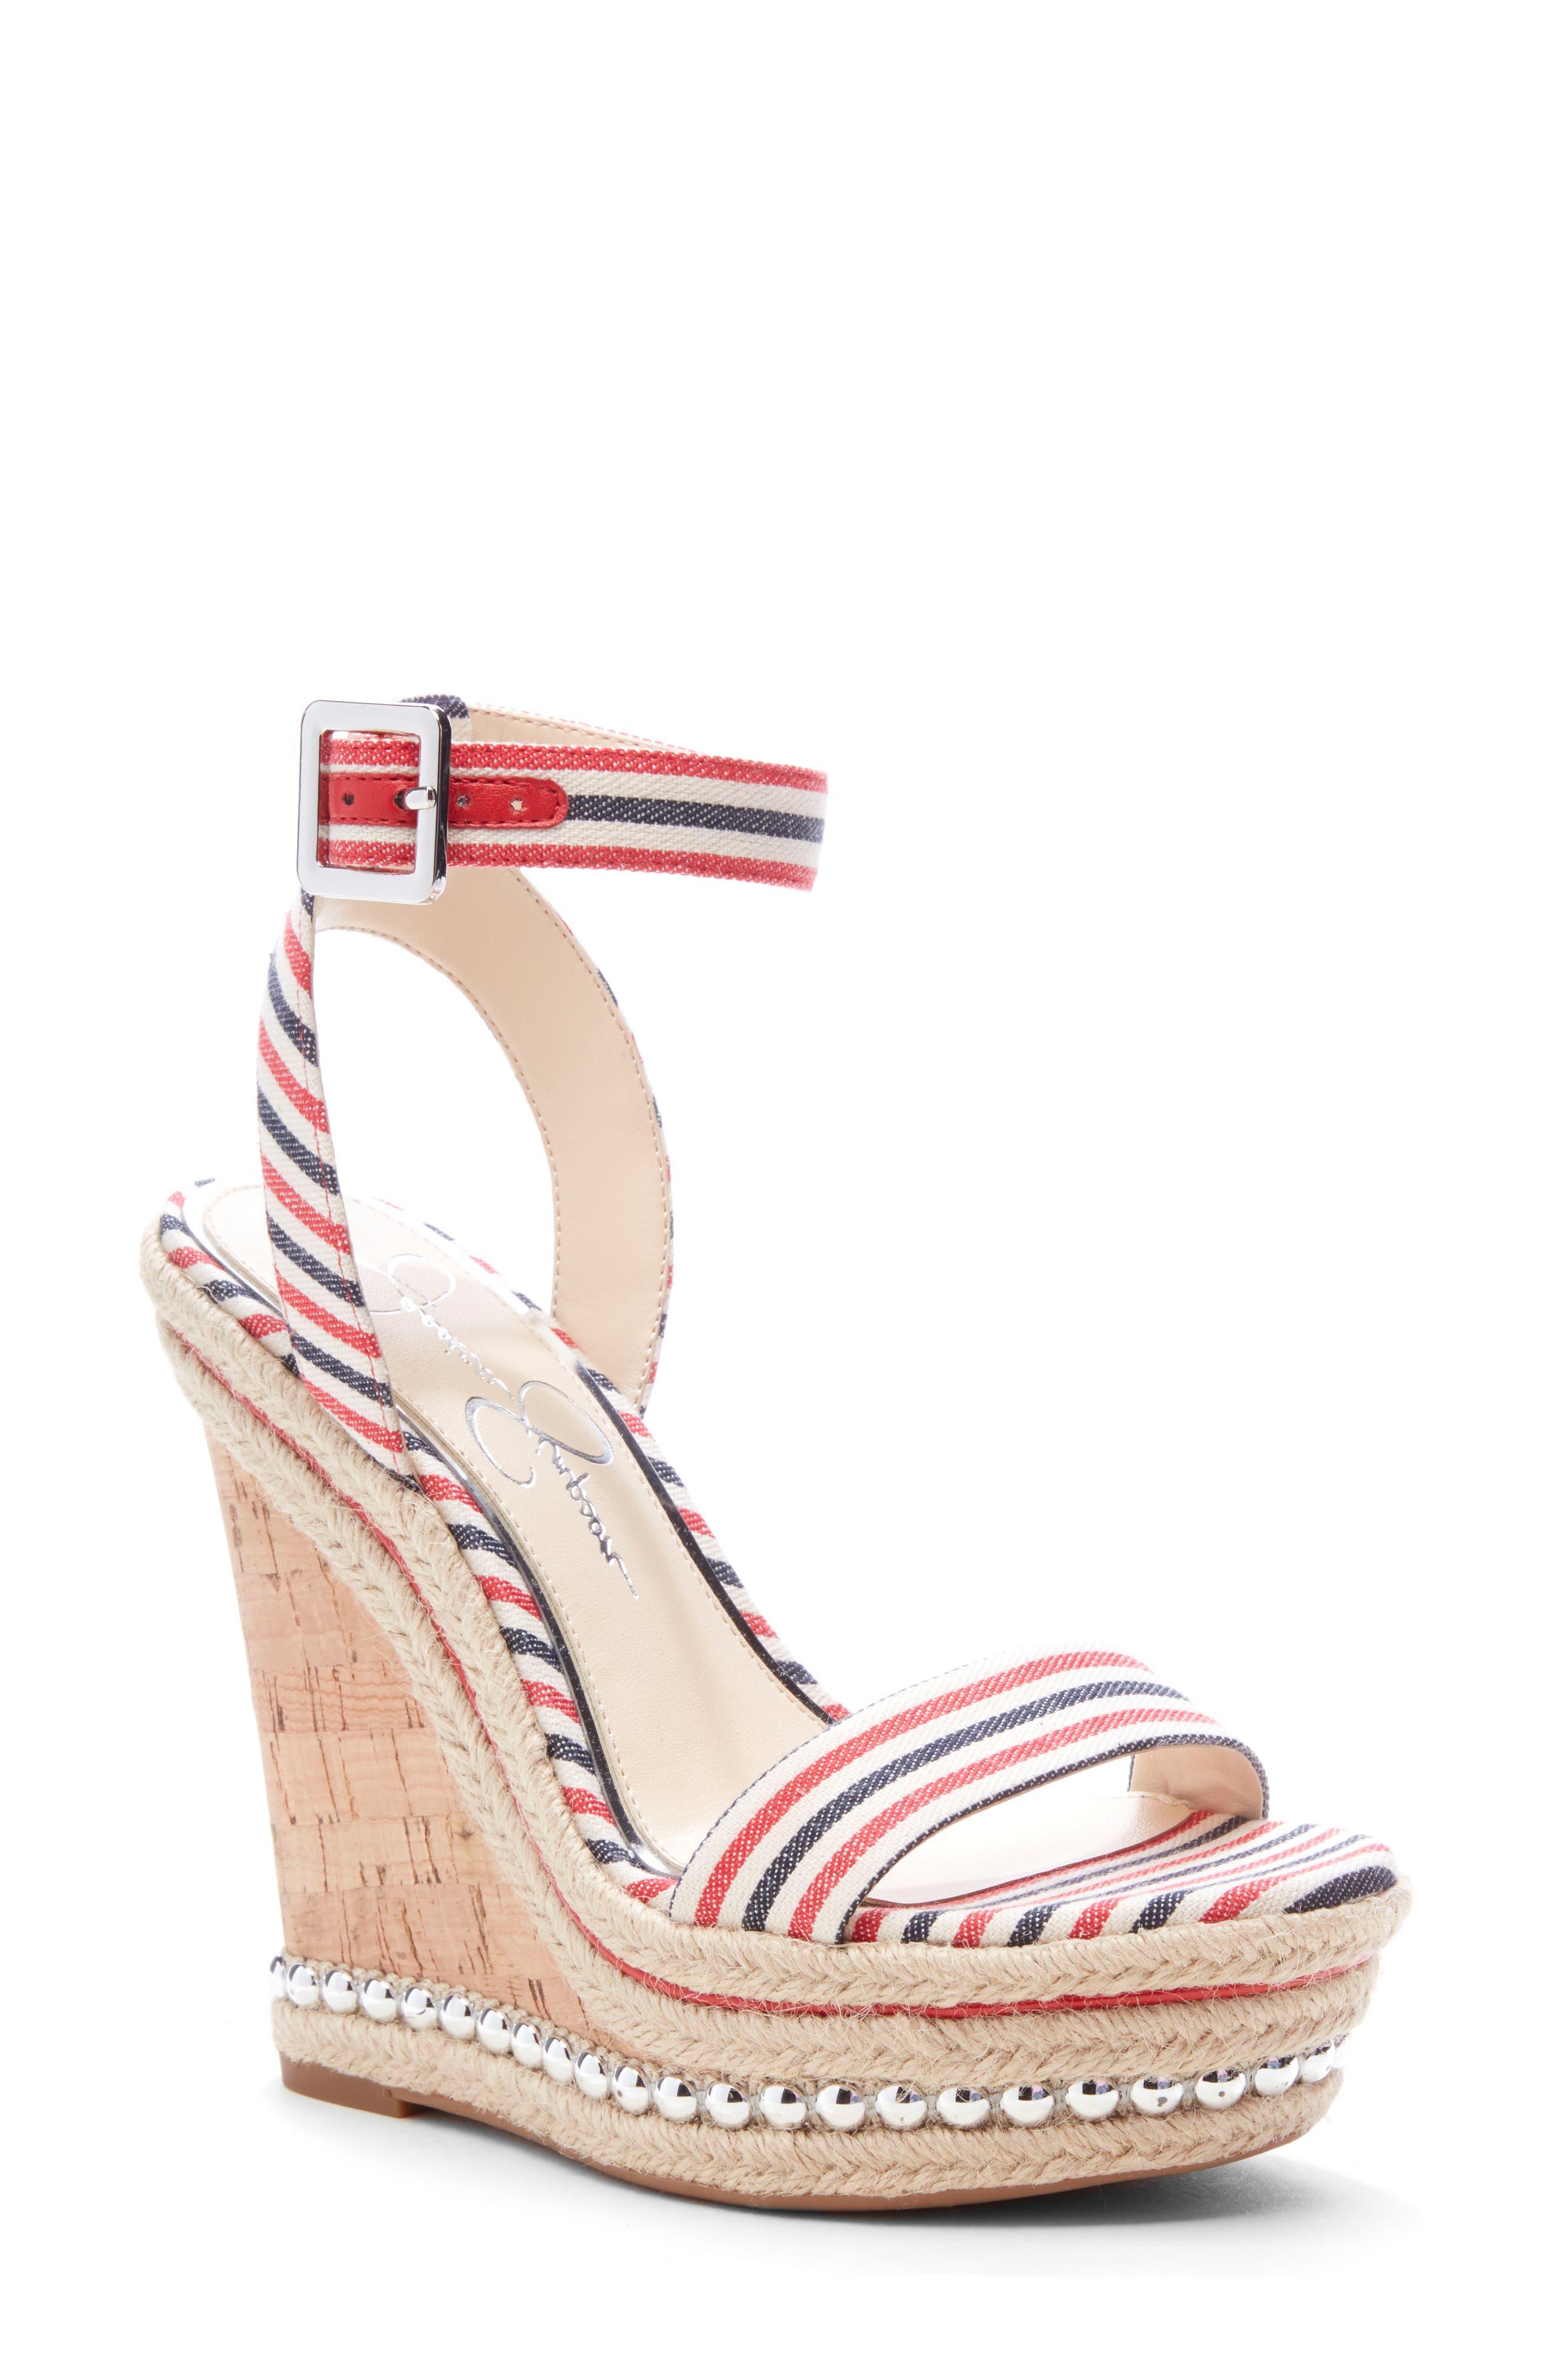 Jessica Simpson Alinda Embellished Wedge Sandal- Red